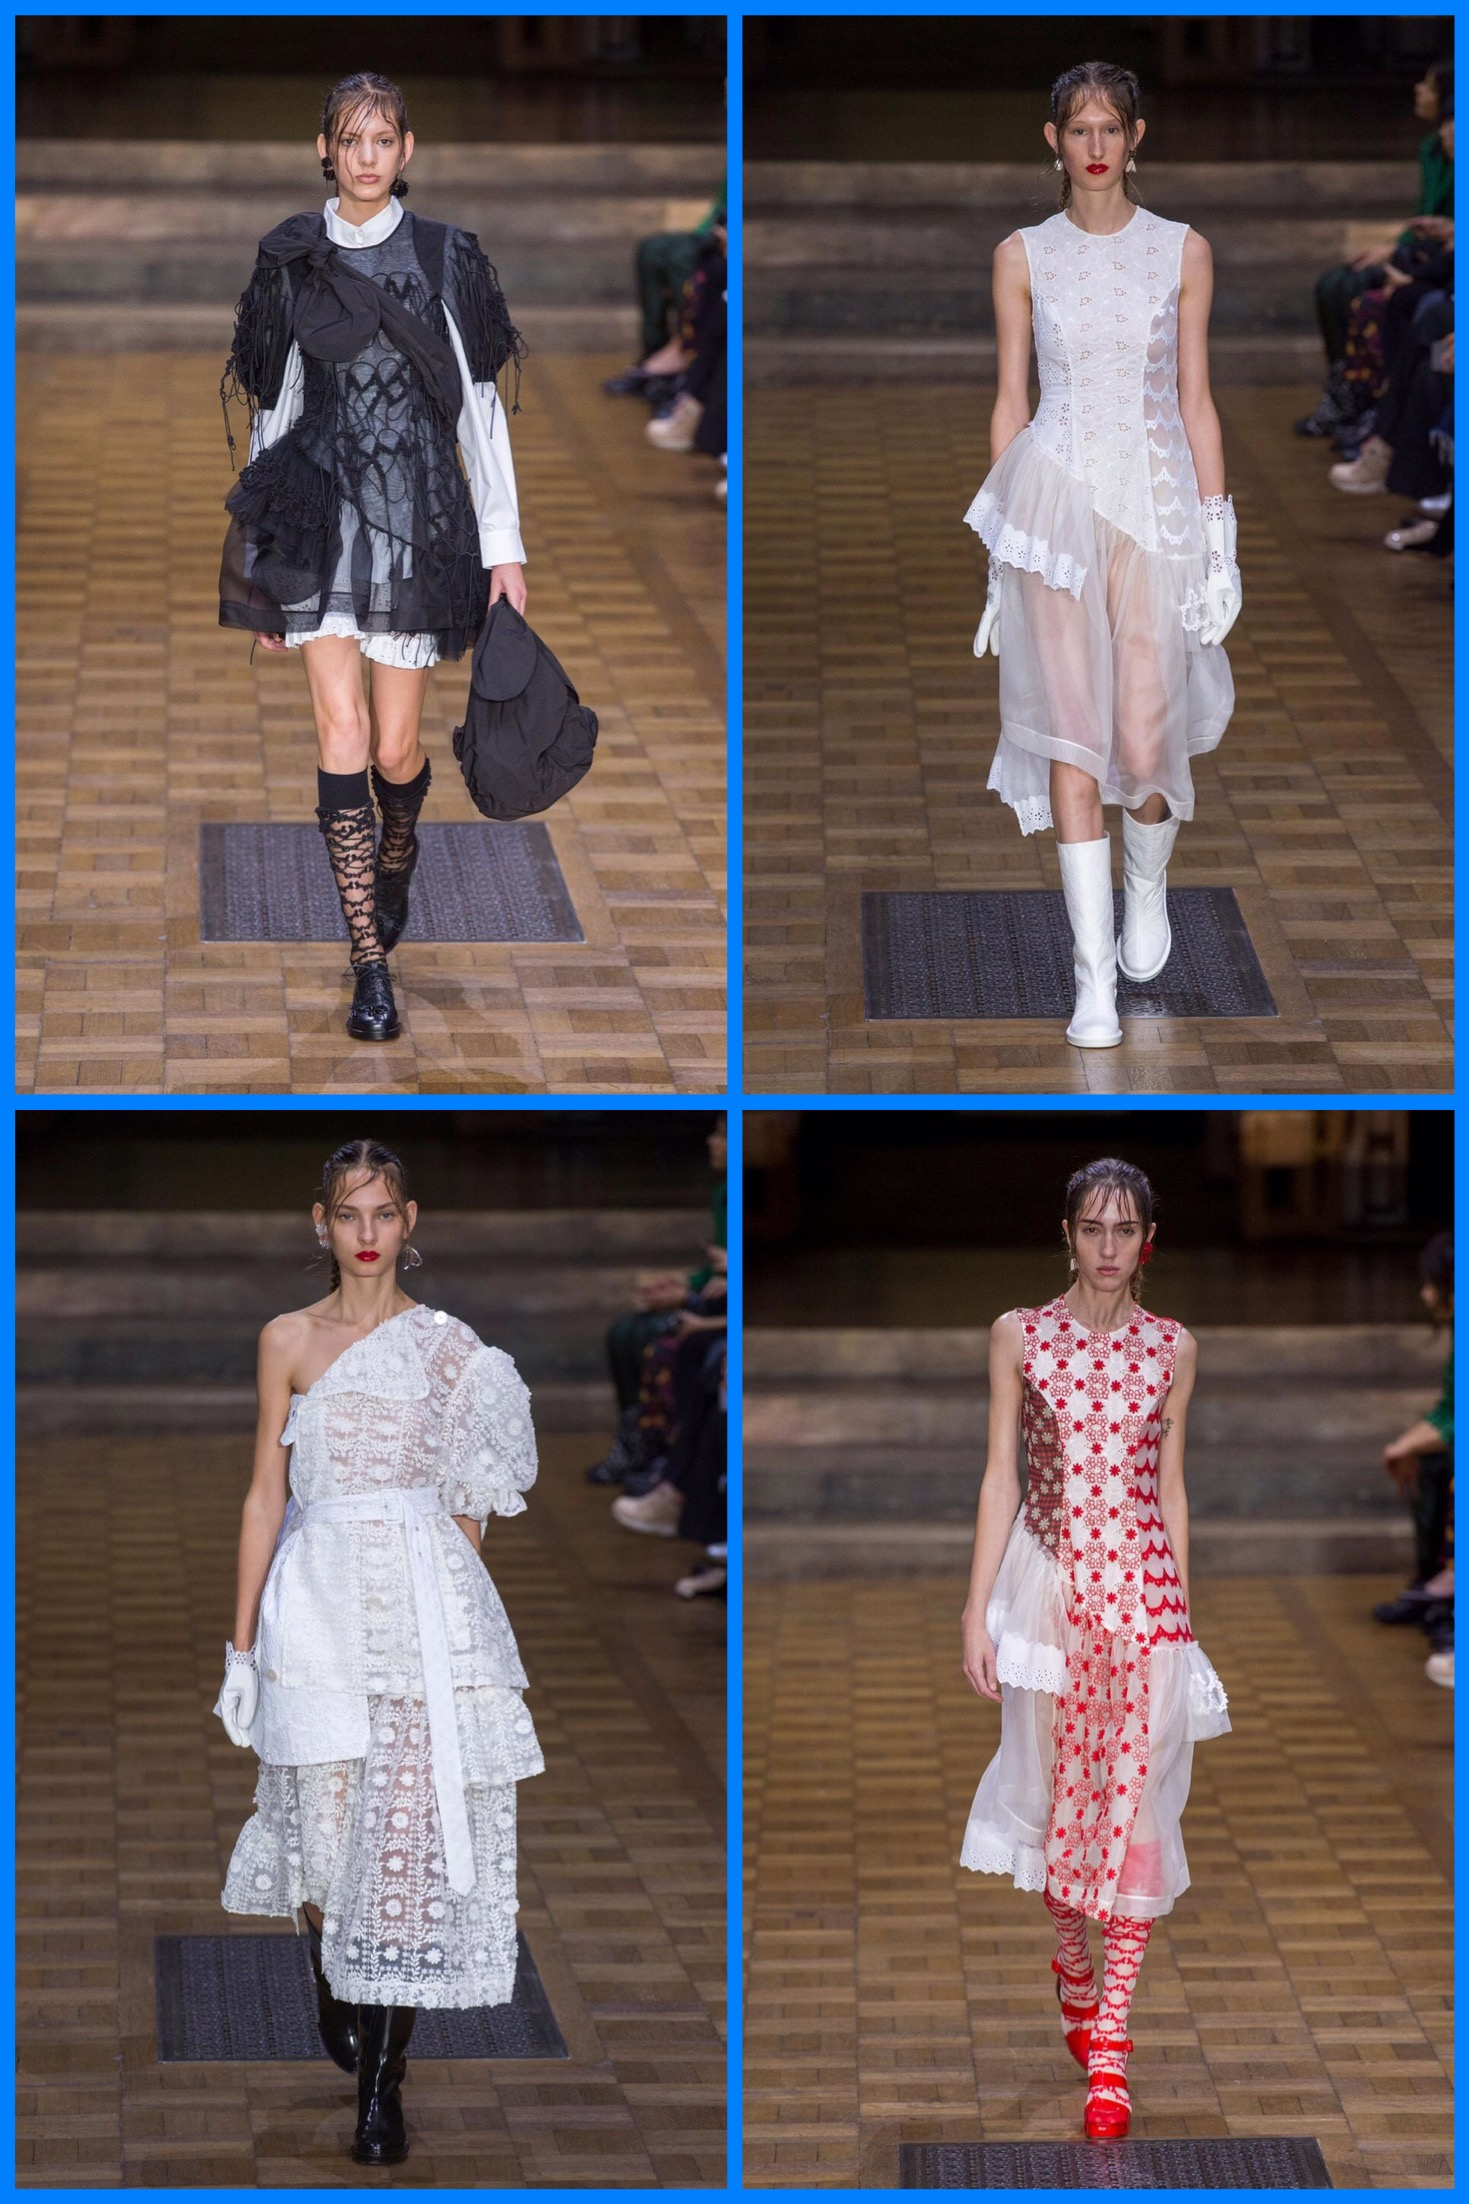 london-fashion-week-pret-a-porter-spring-summer-2017-style-simone-rocha